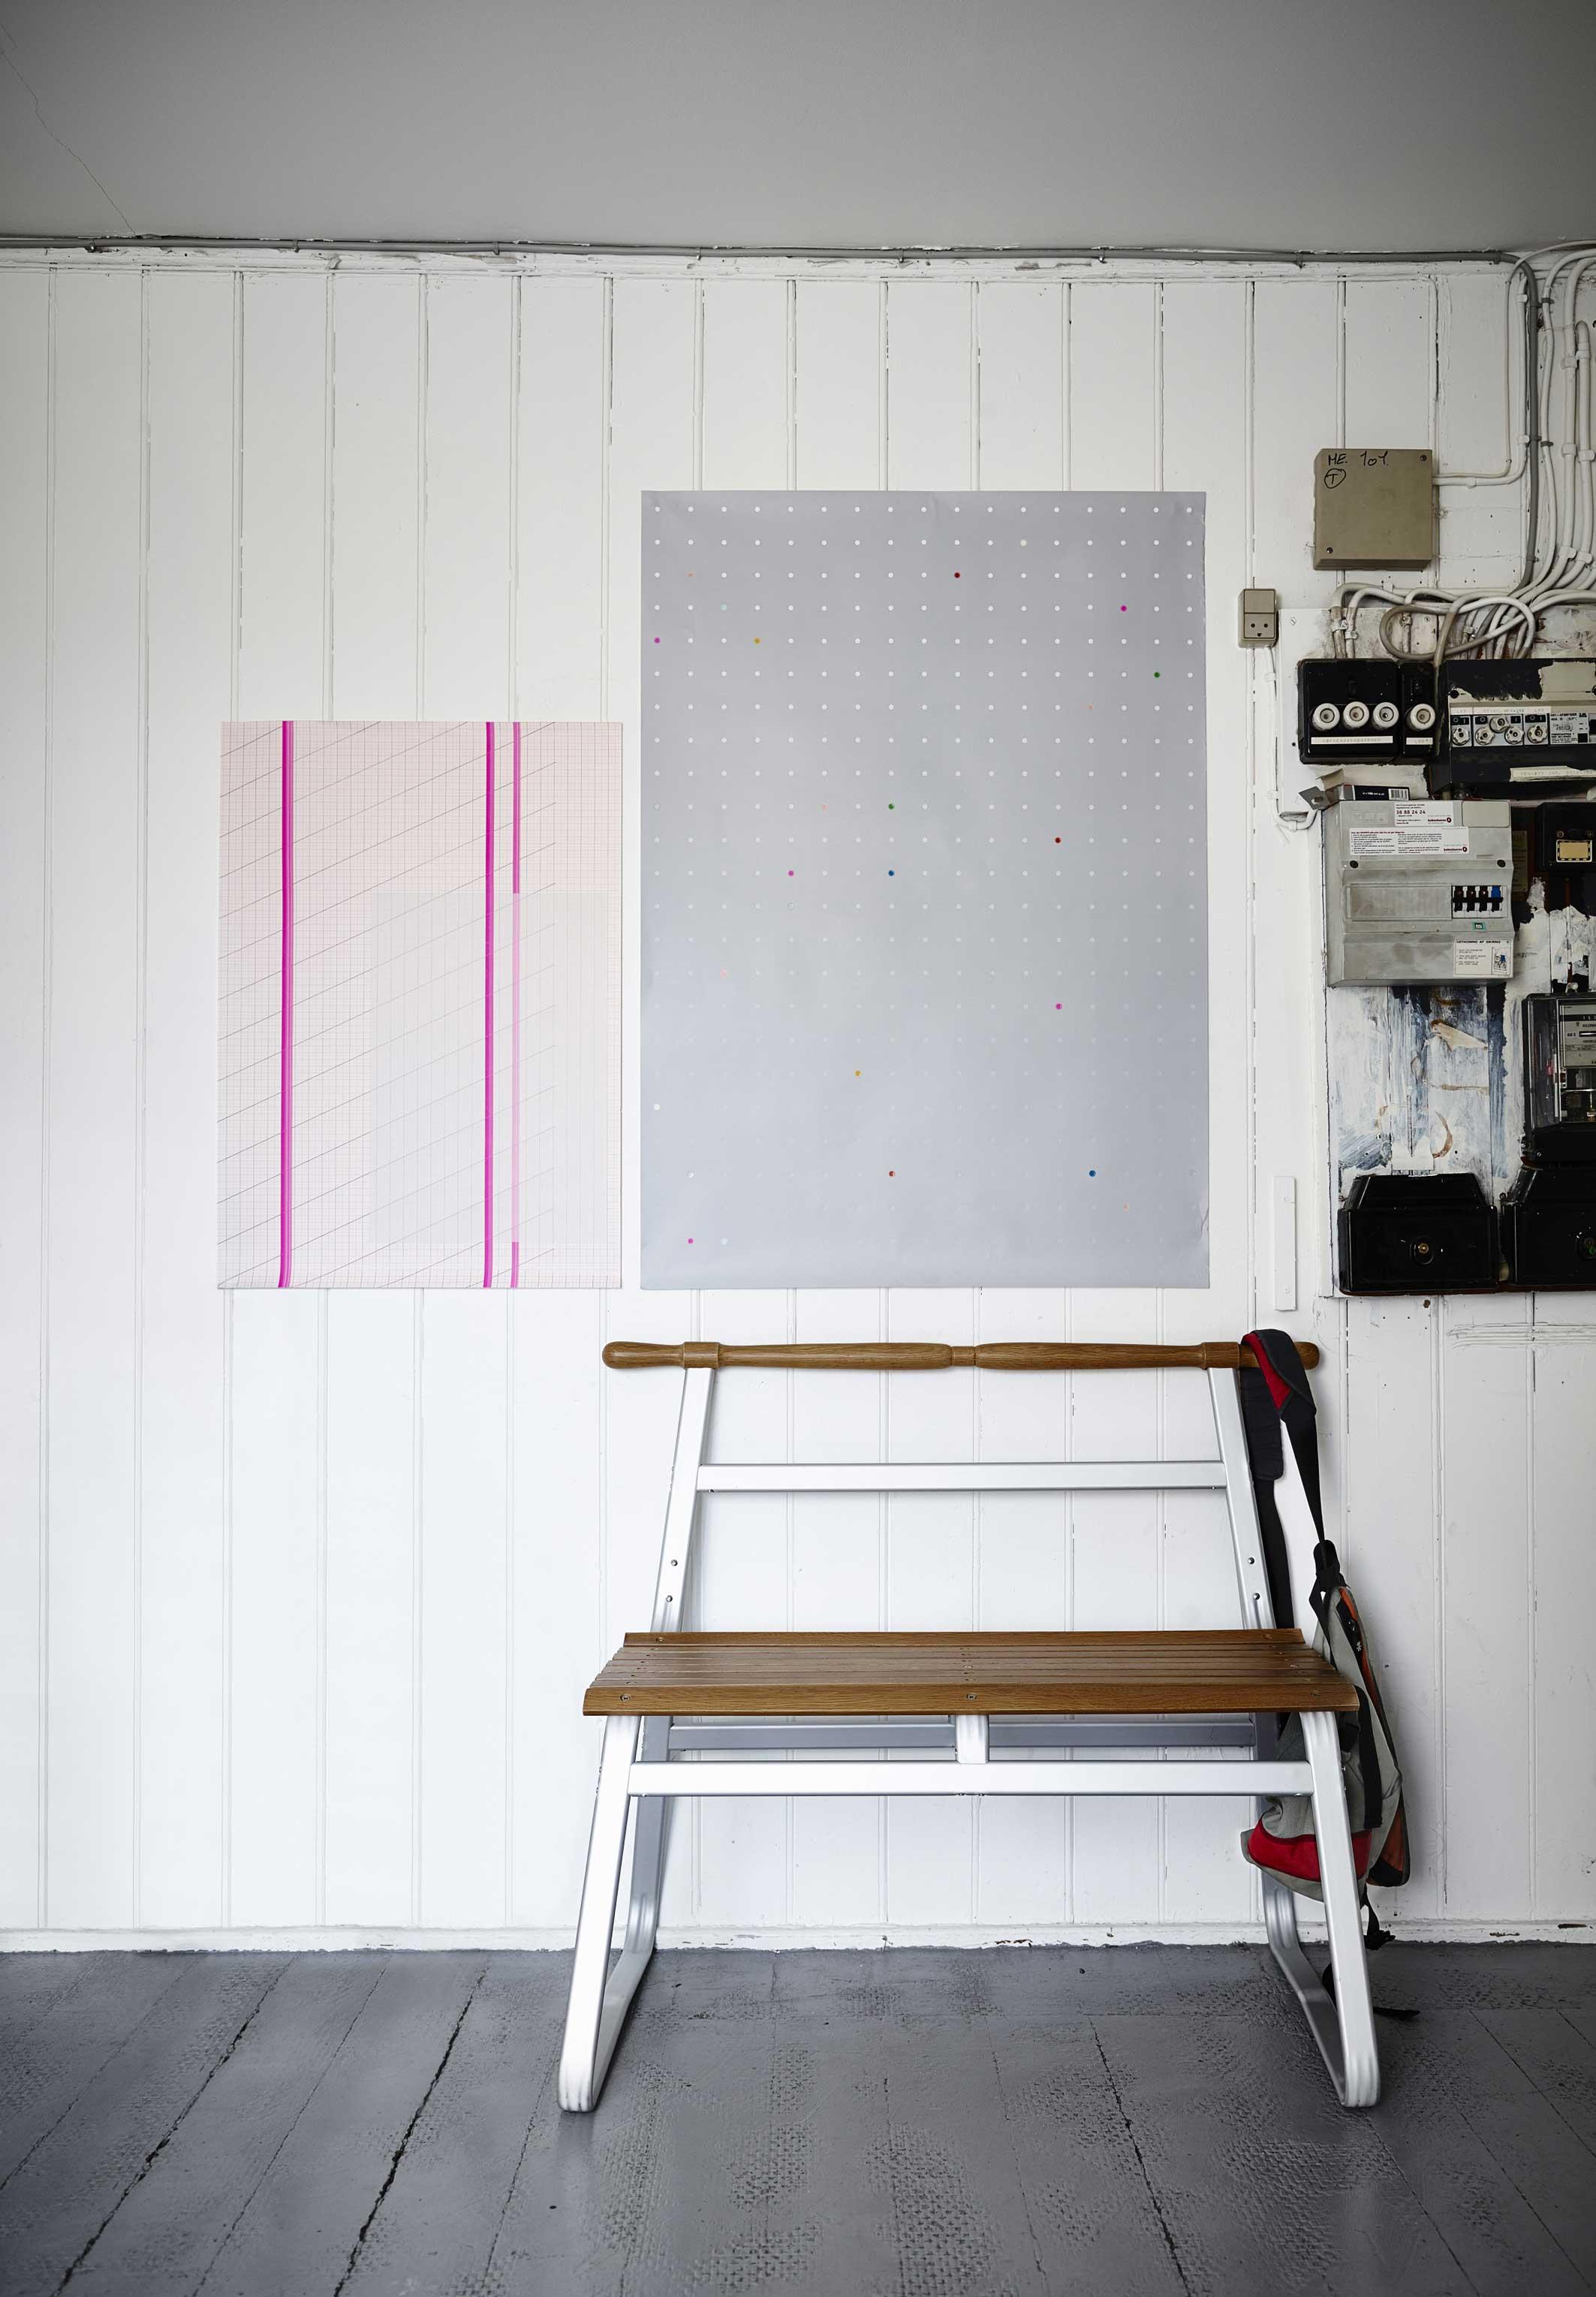 Banc En Bois Ikea : IKEA PS 2014